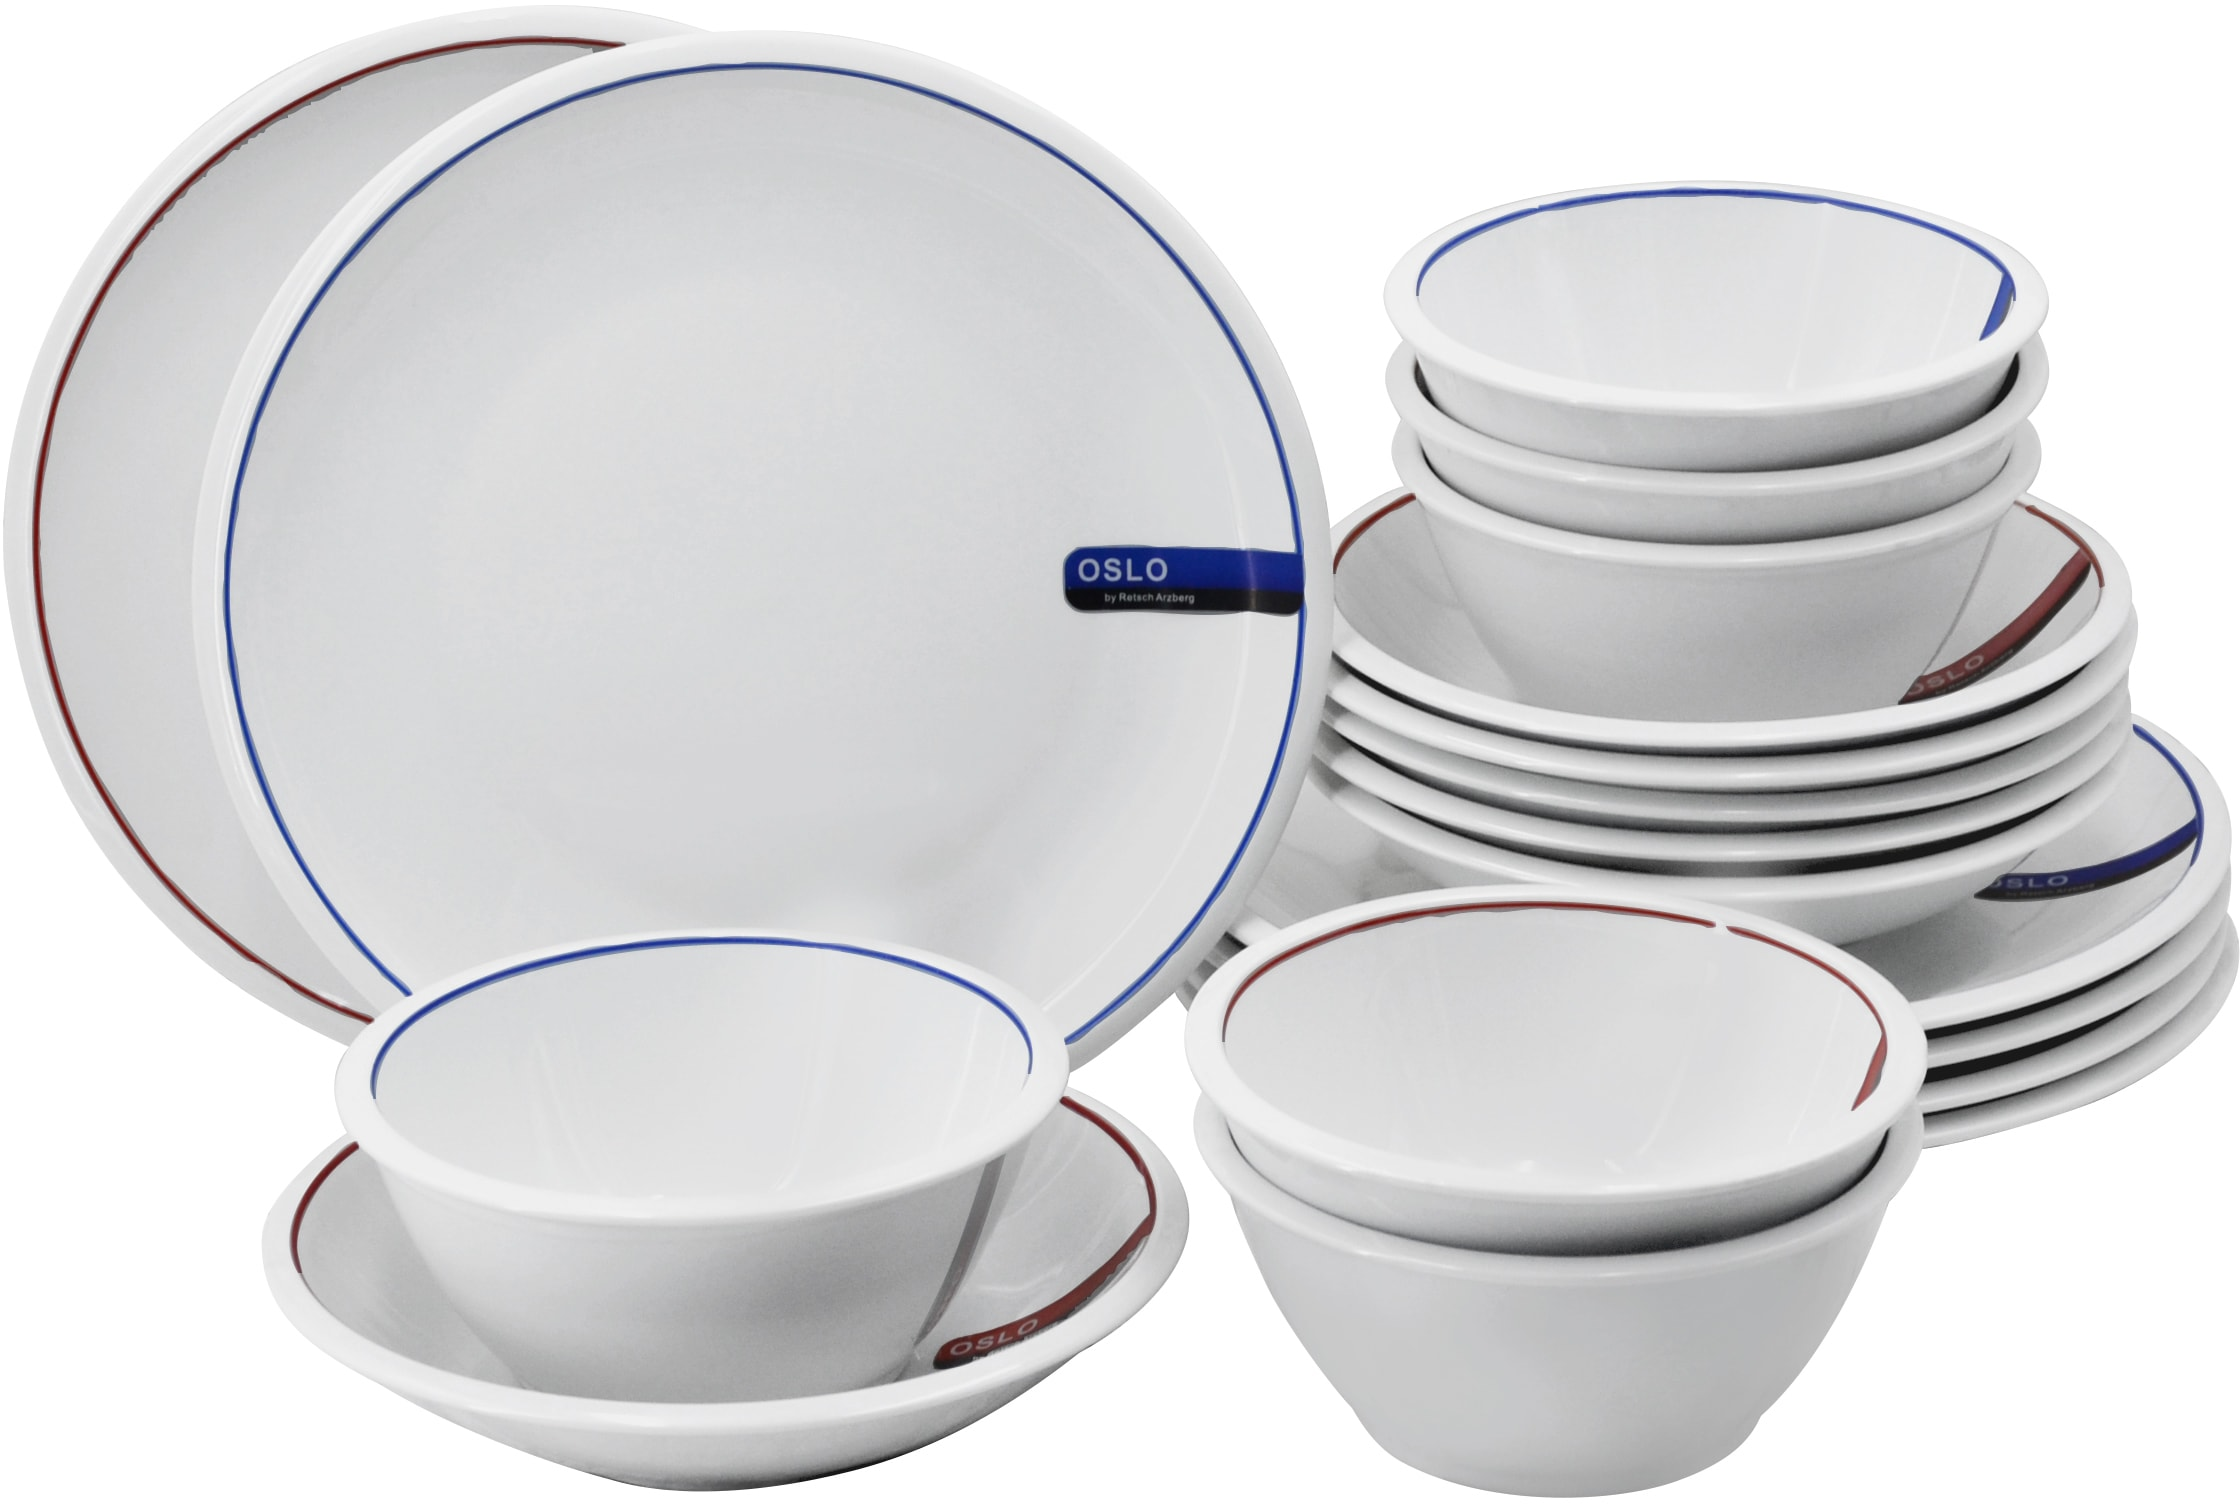 Retsch Arzberg Tafelservice Oslo (18-tlg.), Porzellan weiß Geschirr-Sets Geschirr, Tischaccessoires Haushaltswaren